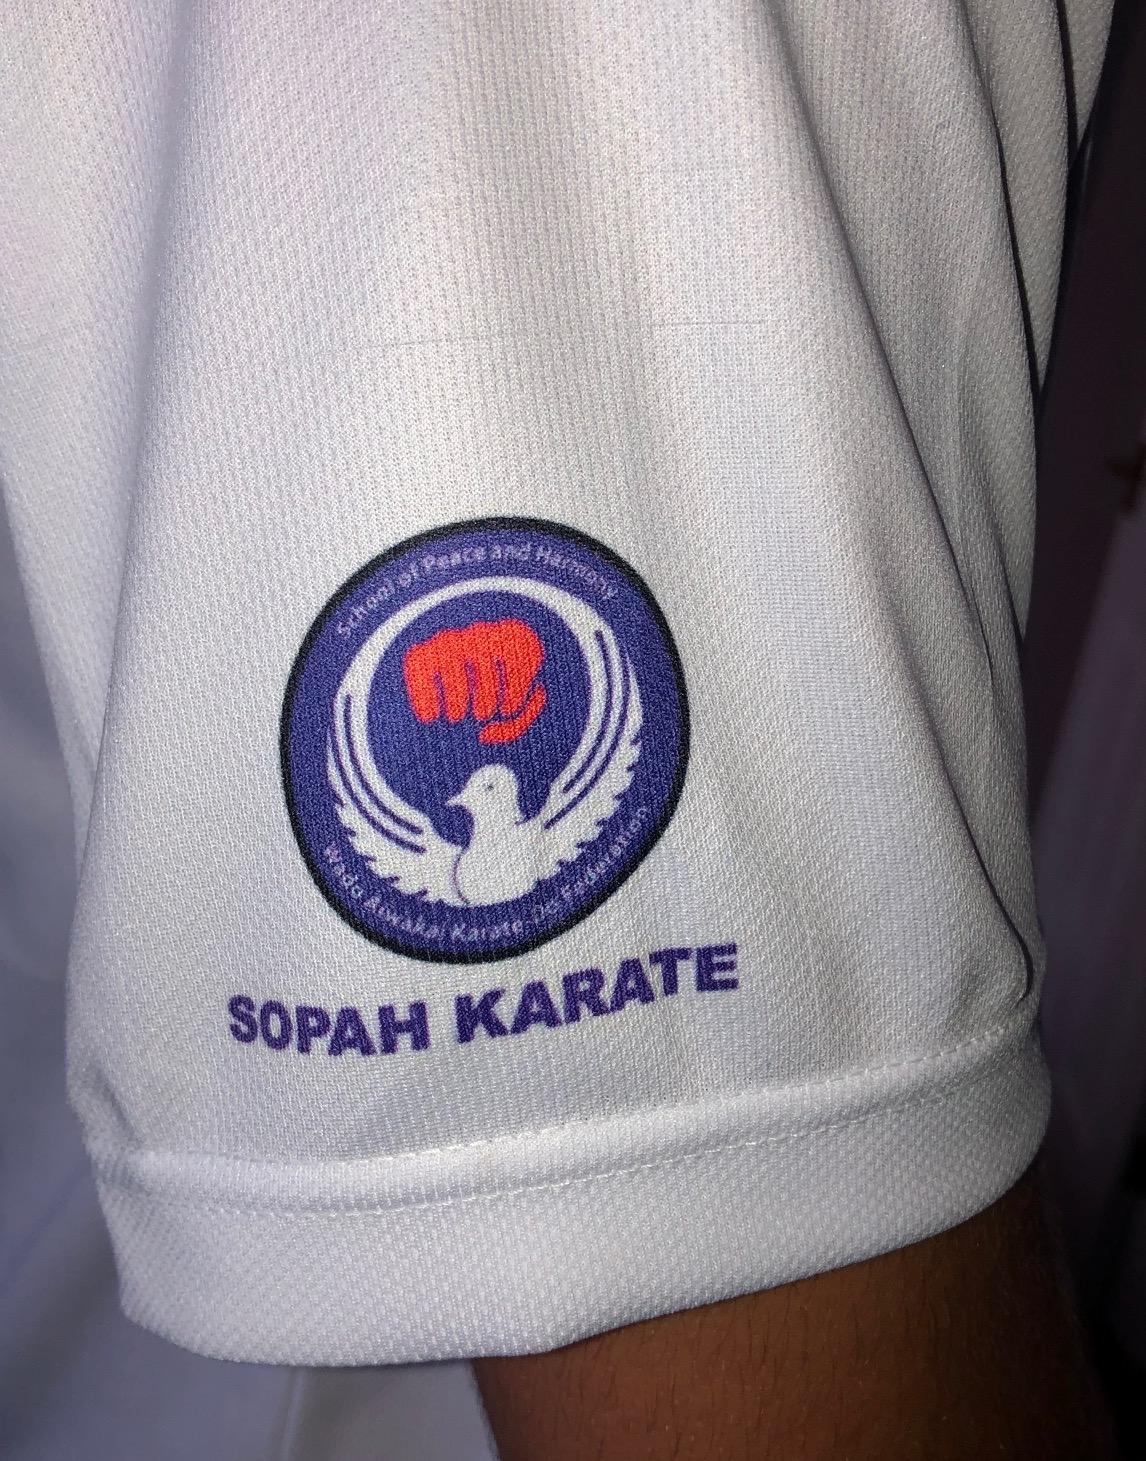 SOPAHKARATE-004 WHITE COOL T-SHIRT